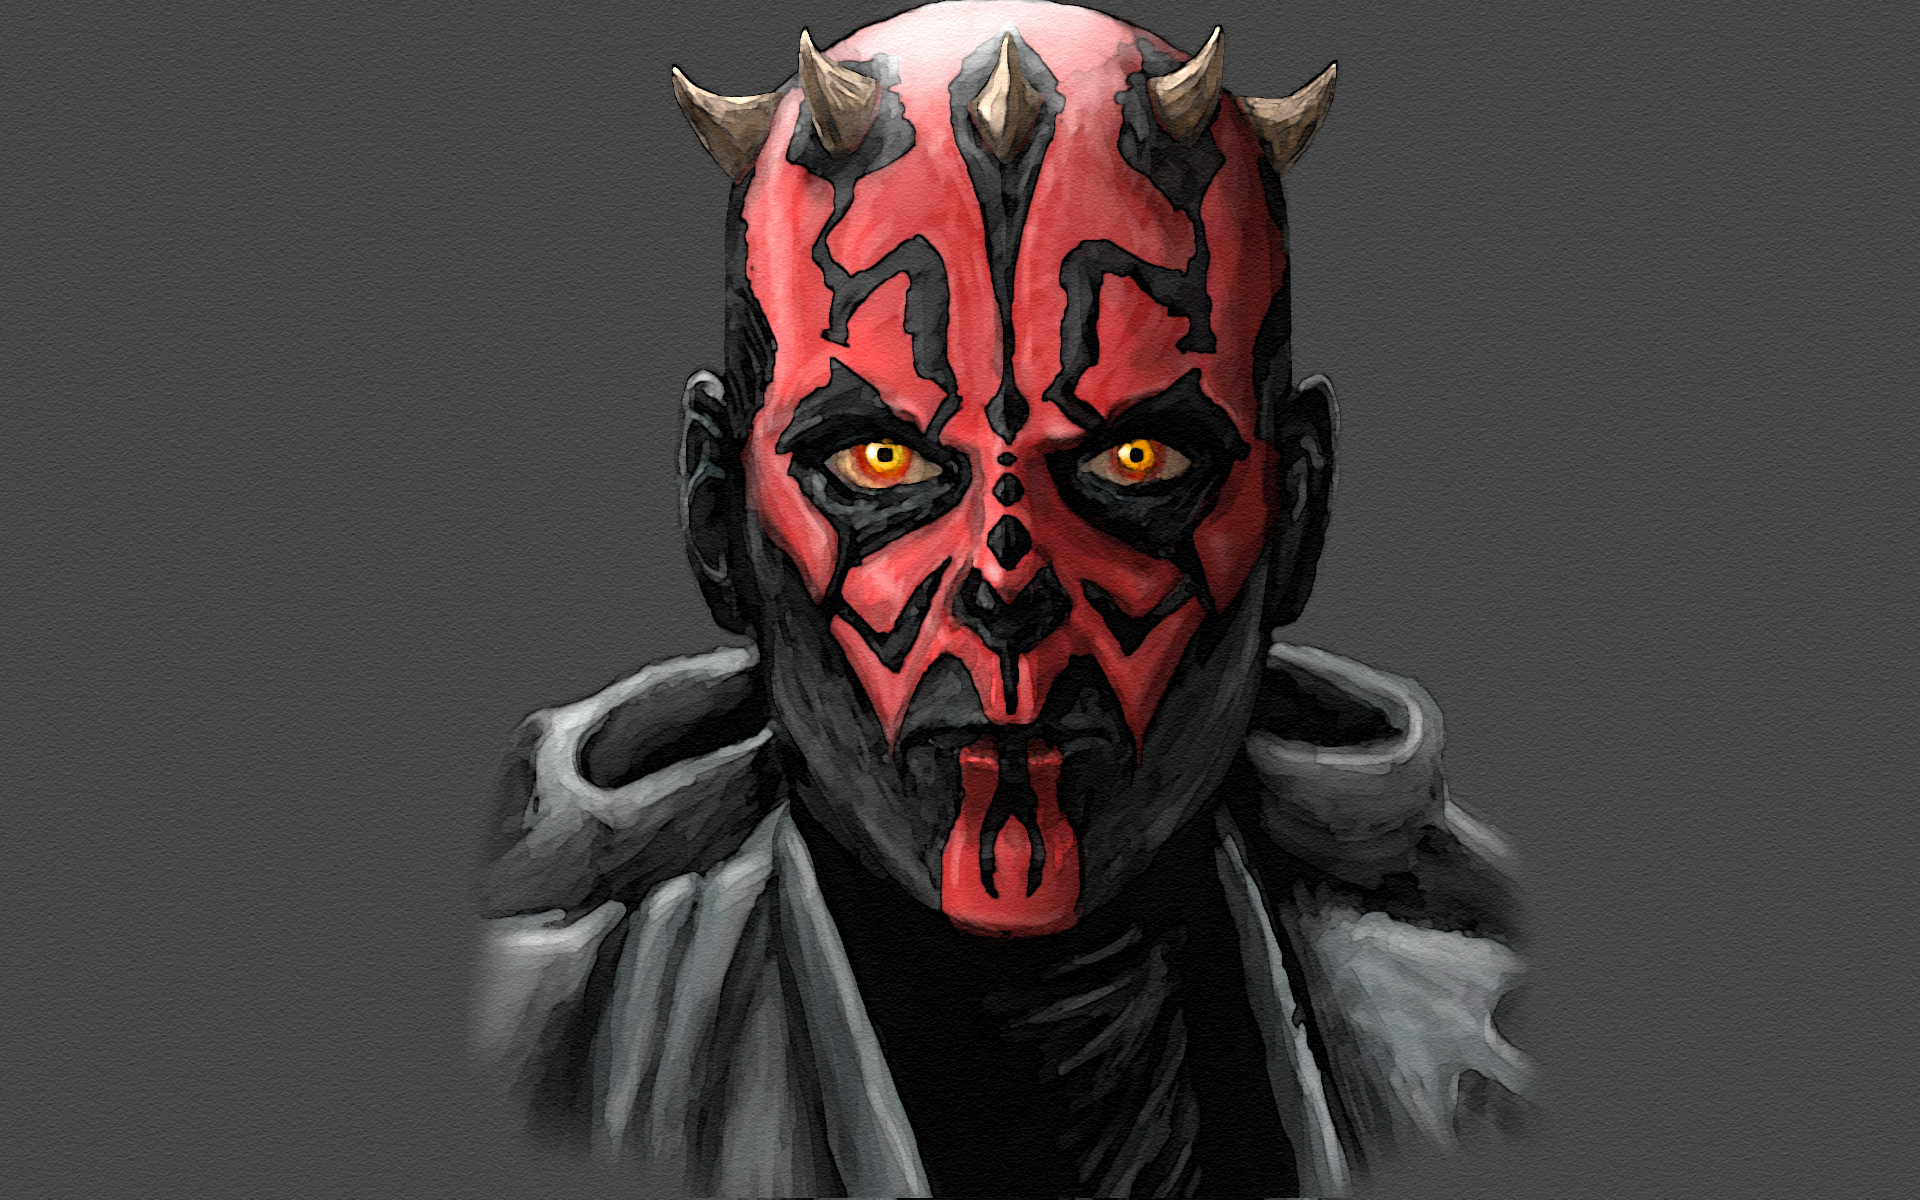 star wars Sith Darth Maul movies wallpaper background